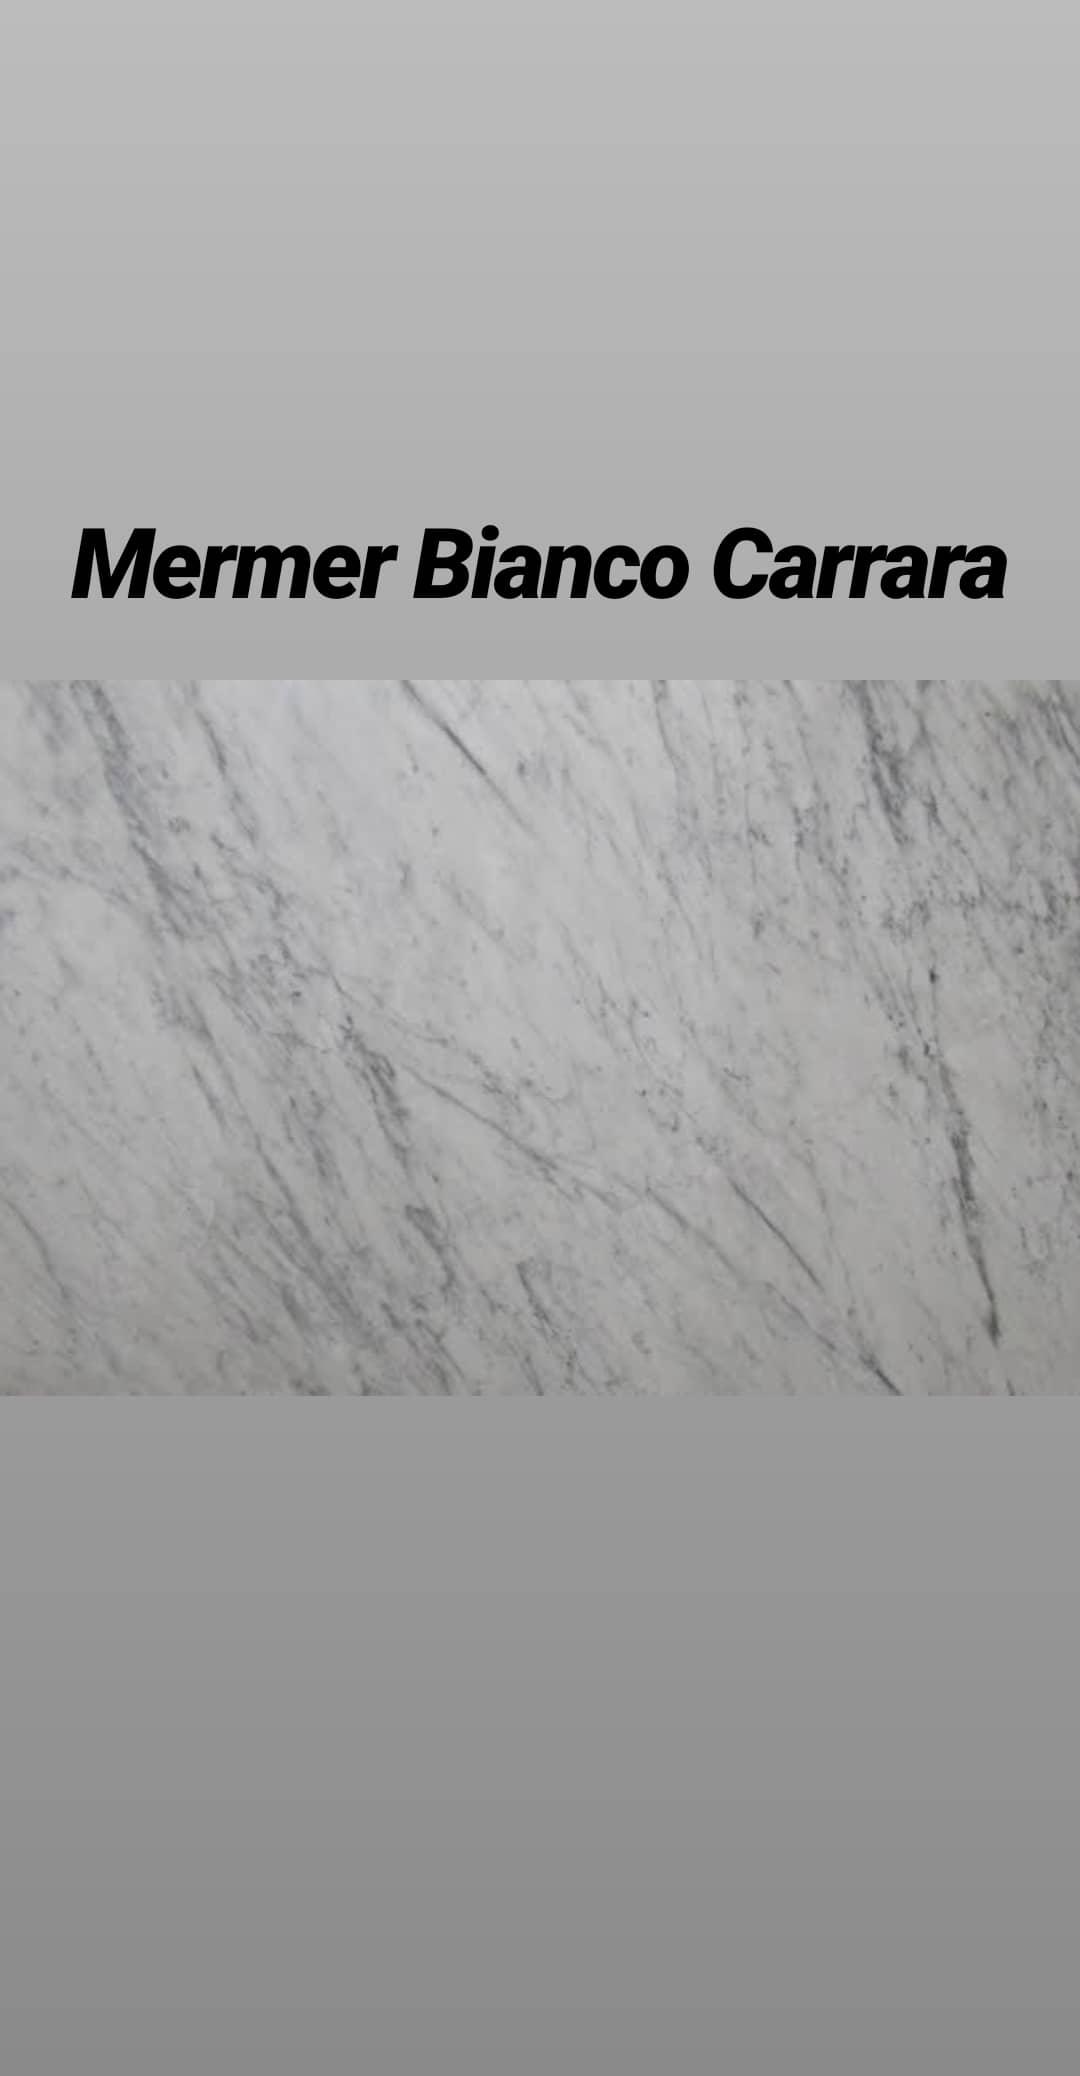 mermer-bianco-carrara---89cbf2ce1527b670a5ecfc8ab2c15f15f5f1594d